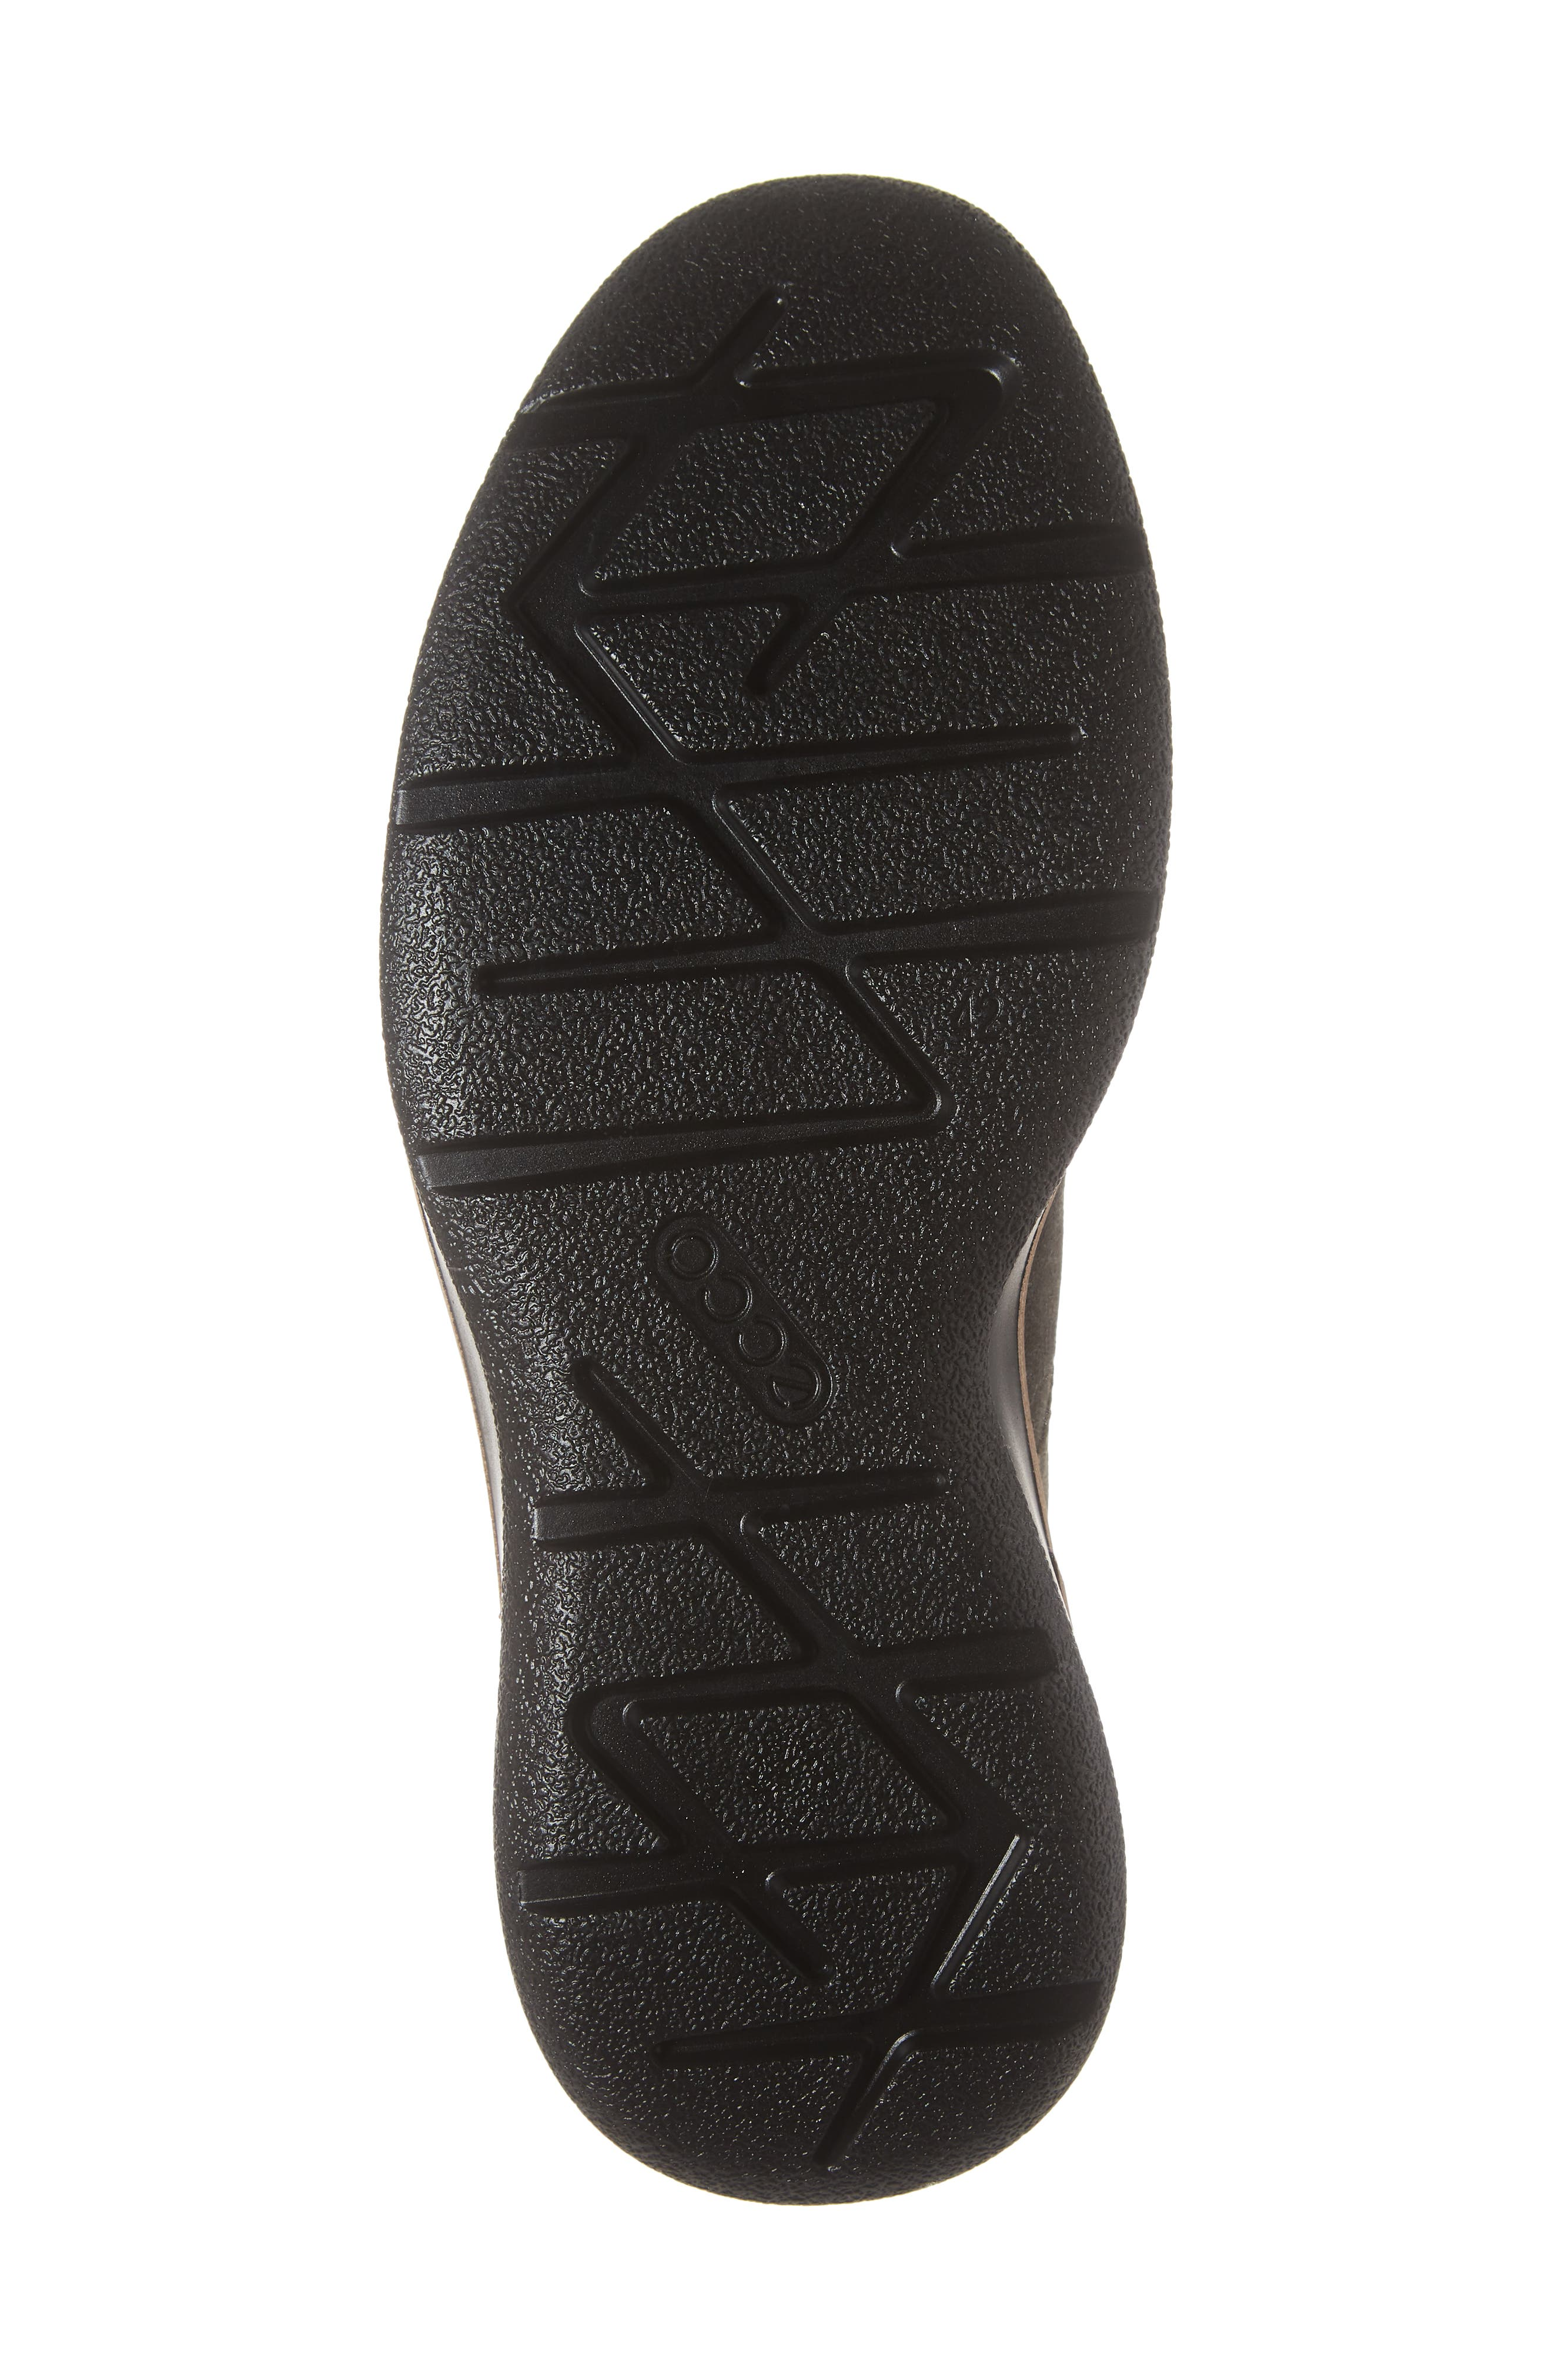 Aurora Plain Toe Boot,                             Alternate thumbnail 6, color,                             TARMAC SUEDE